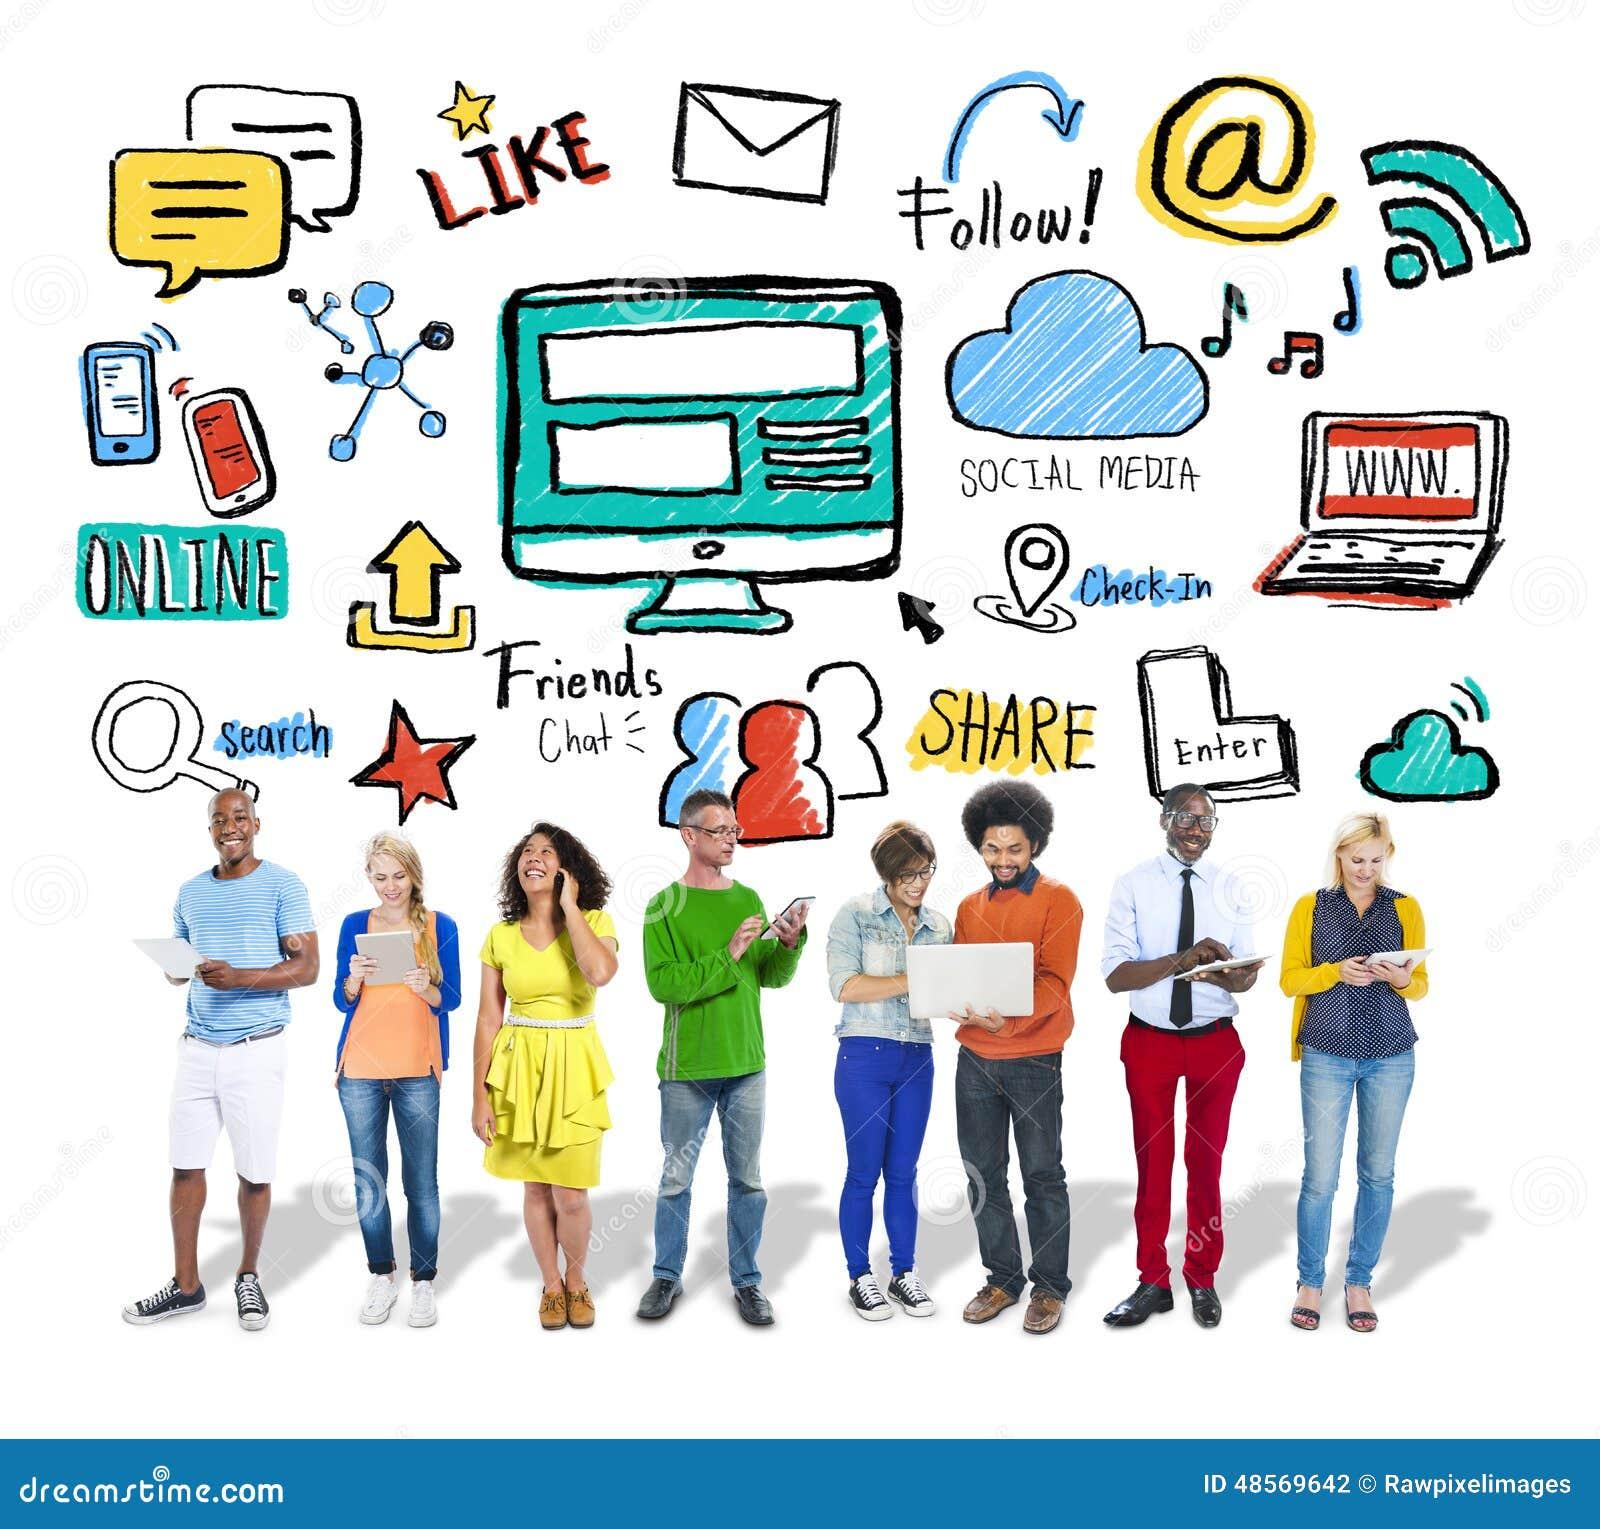 Importance of sharing essay